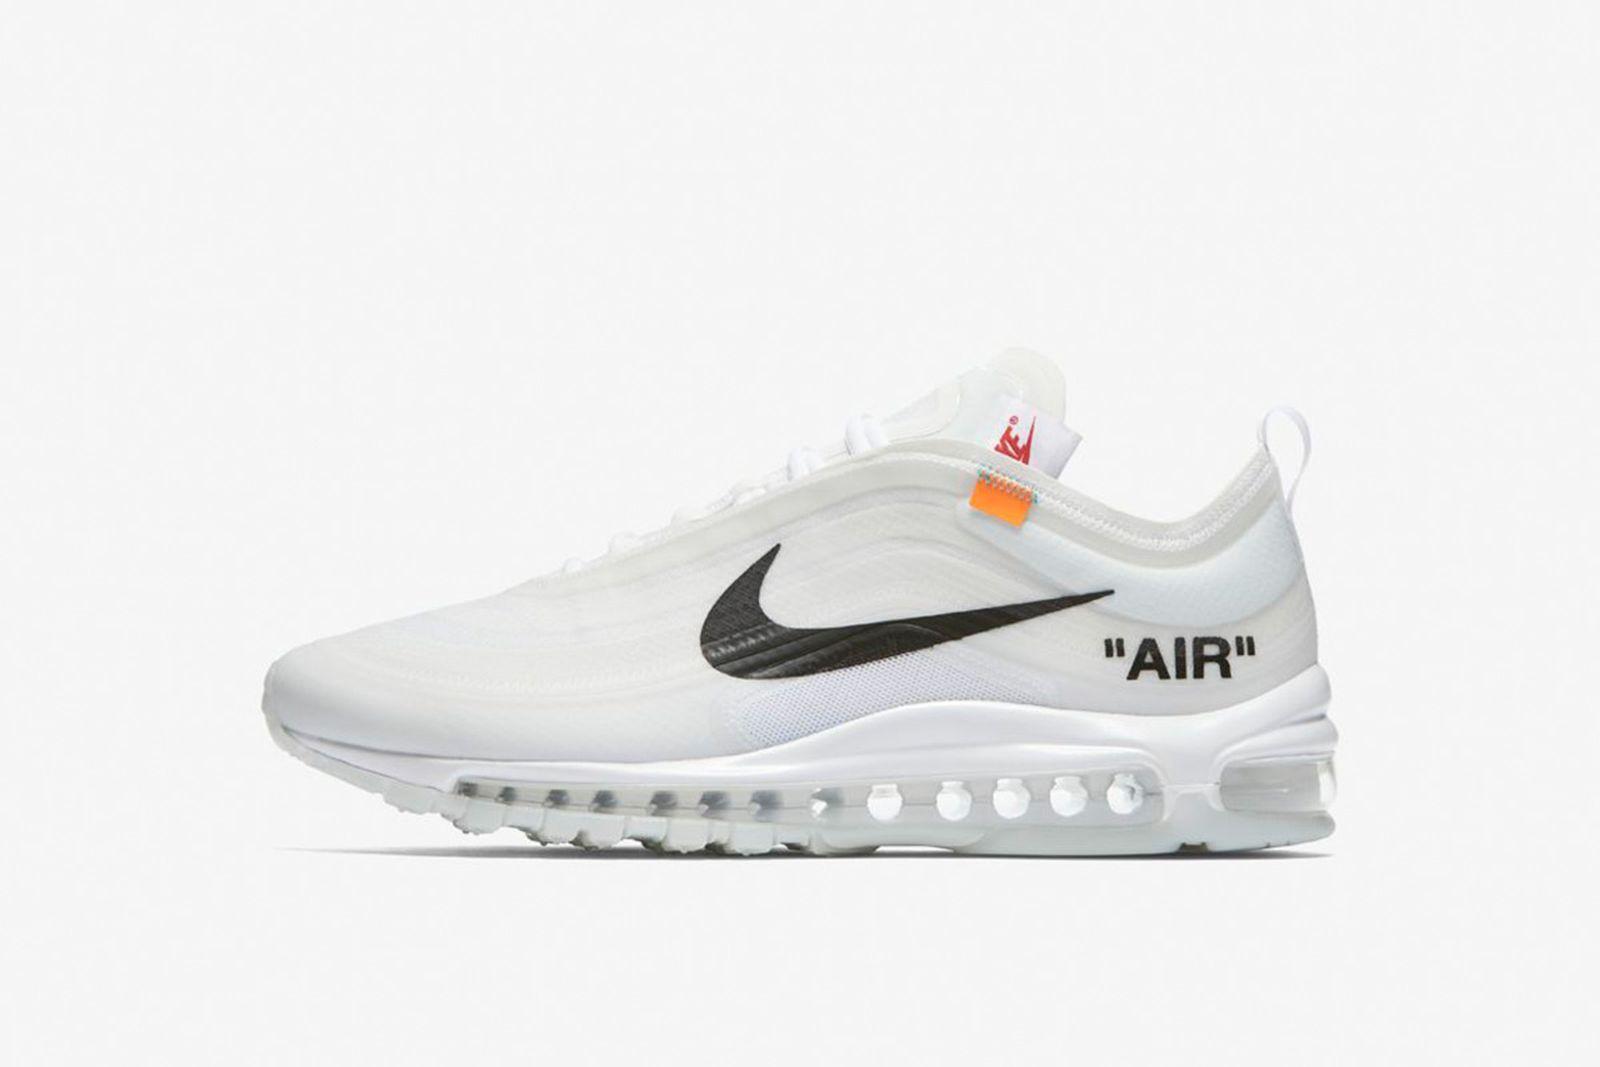 air max 97 GOAT Nike The Ten OFF-WHITE c/o Virgil Abloh